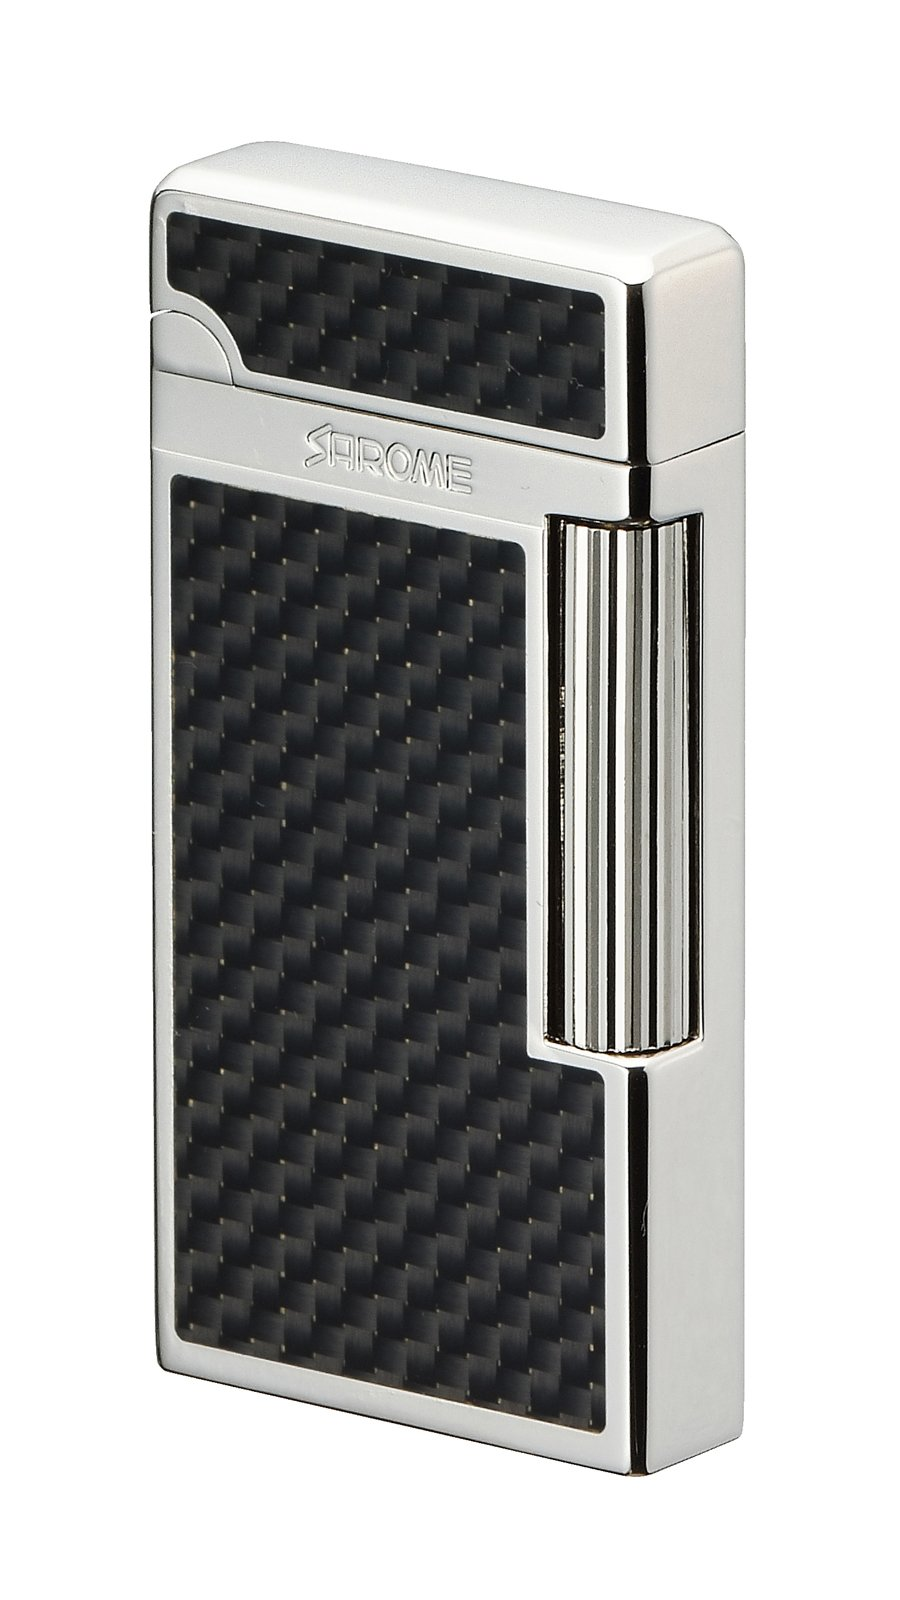 Sarome Flint Lighter SD6A-03 Silver / Black carbon fiber